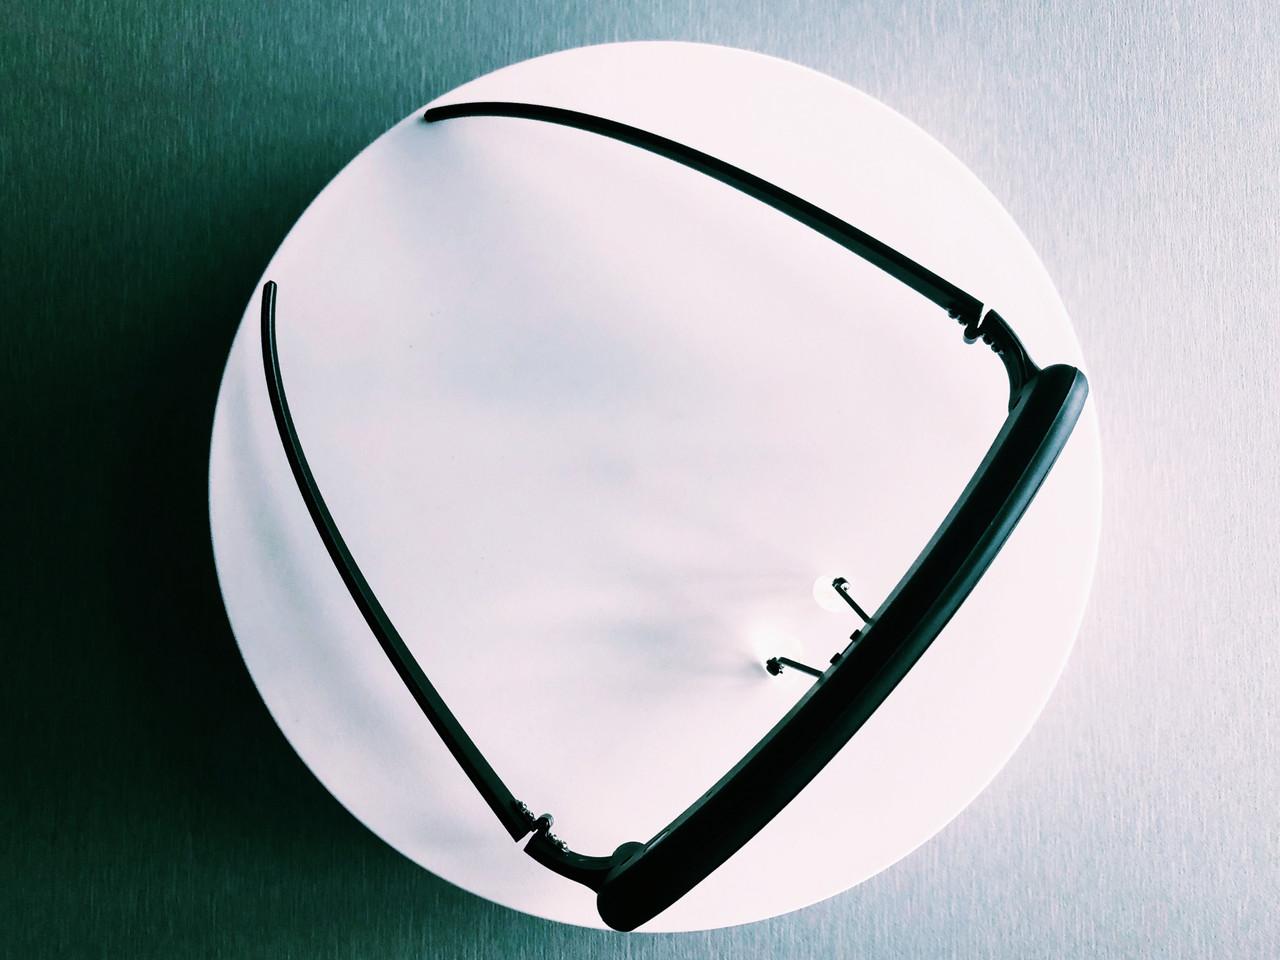 GlassOuse Assistive Device